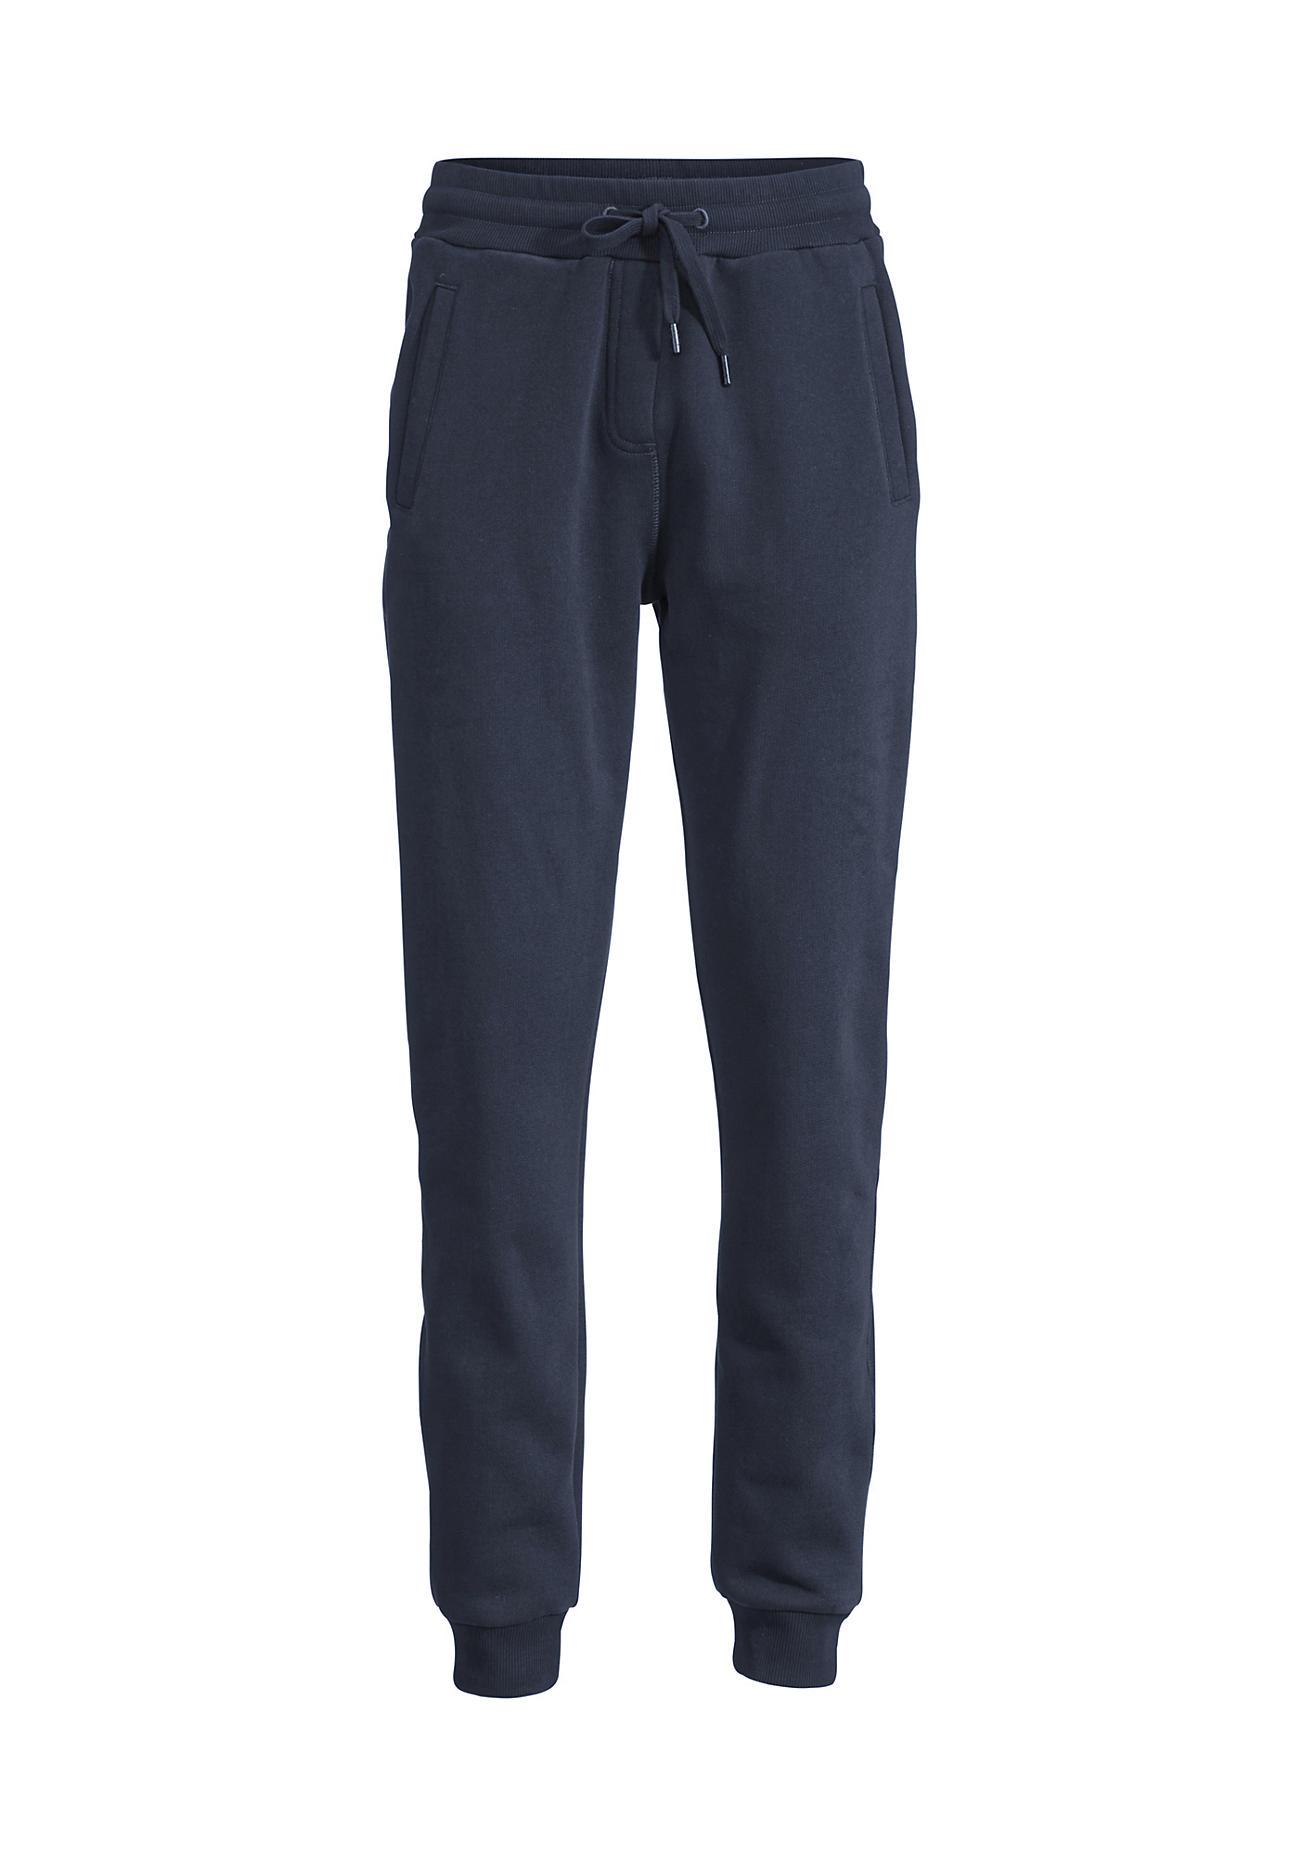 hessnatur Loungewear Sweathose aus Bio-Baumwolle – blau – Größe 36